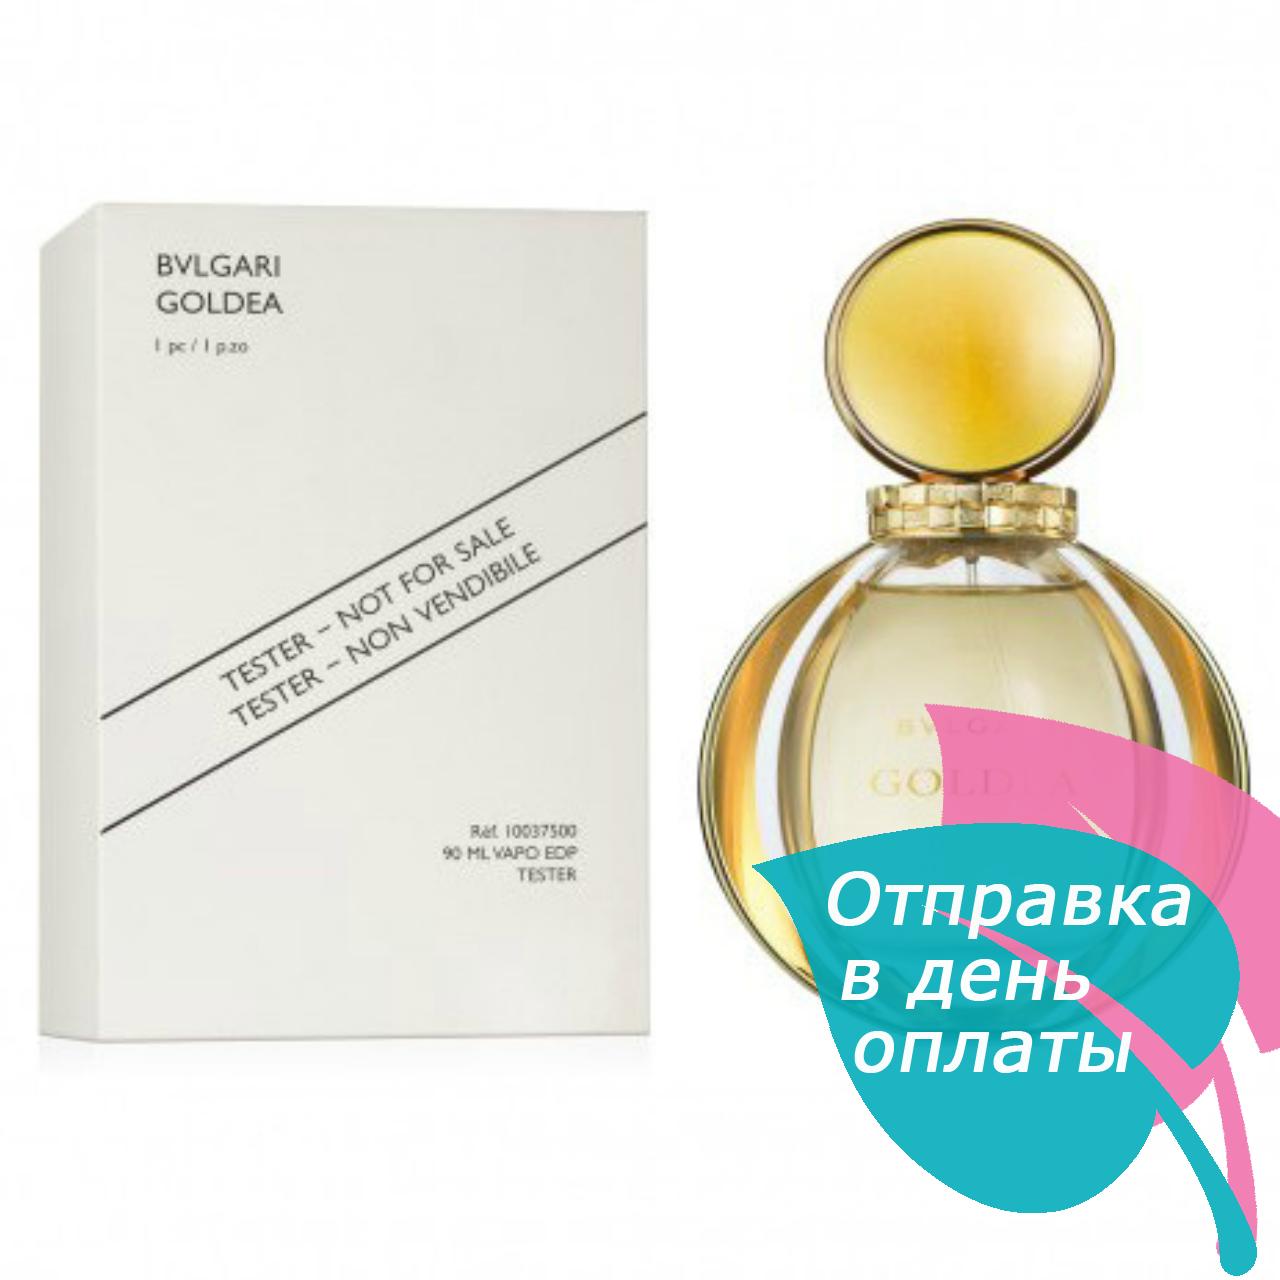 Bvlgari Goldea TESTER женский, 90 мл